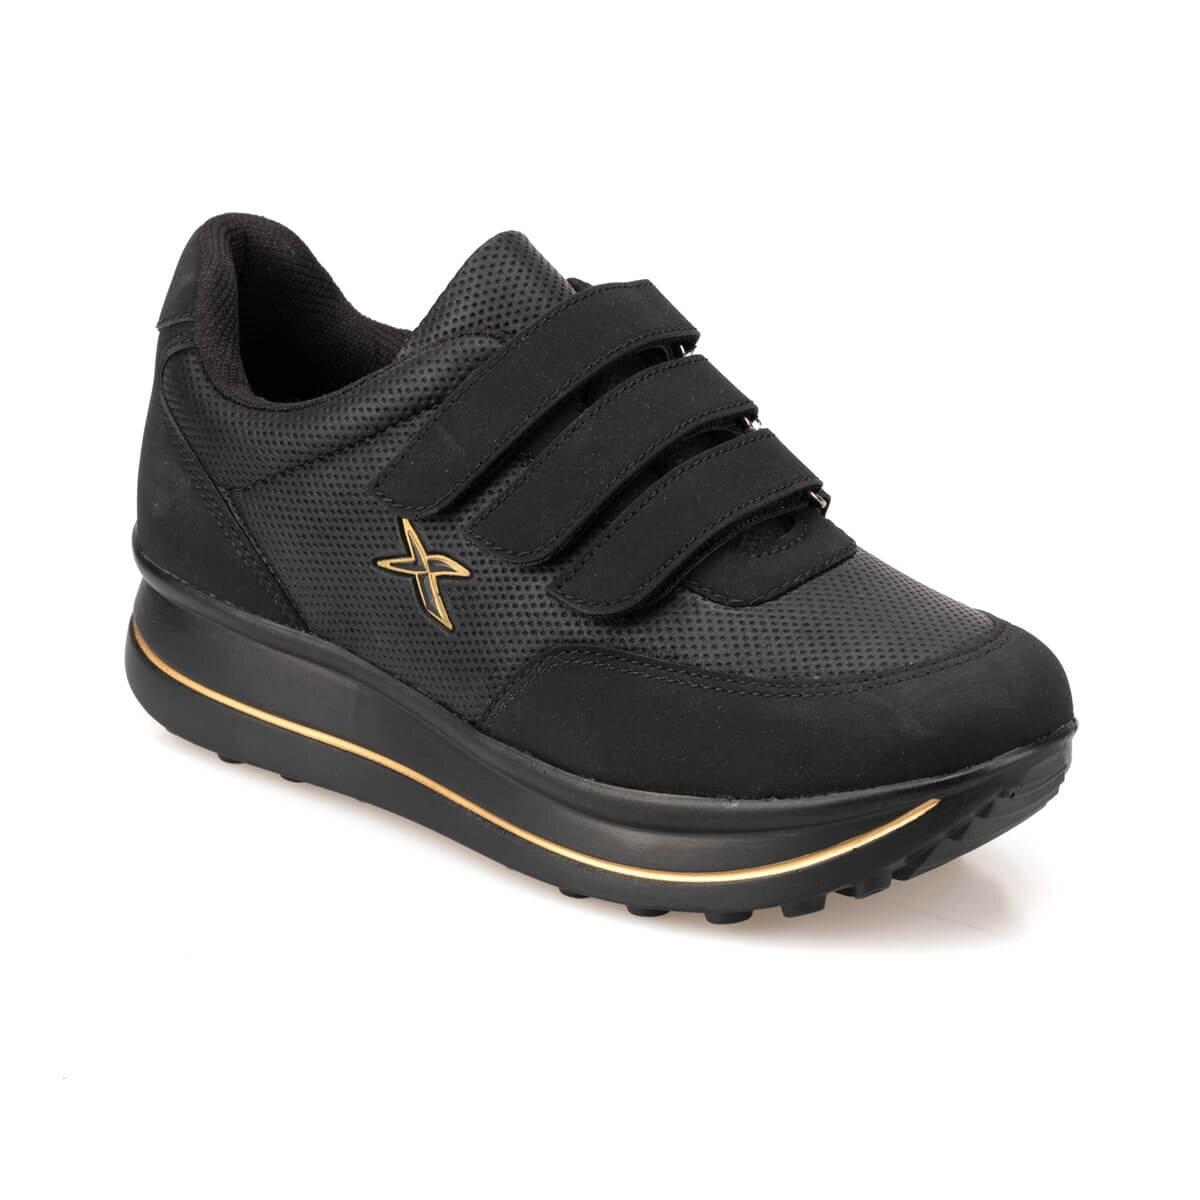 FLO PAULET Black Women Shoes KINETIX